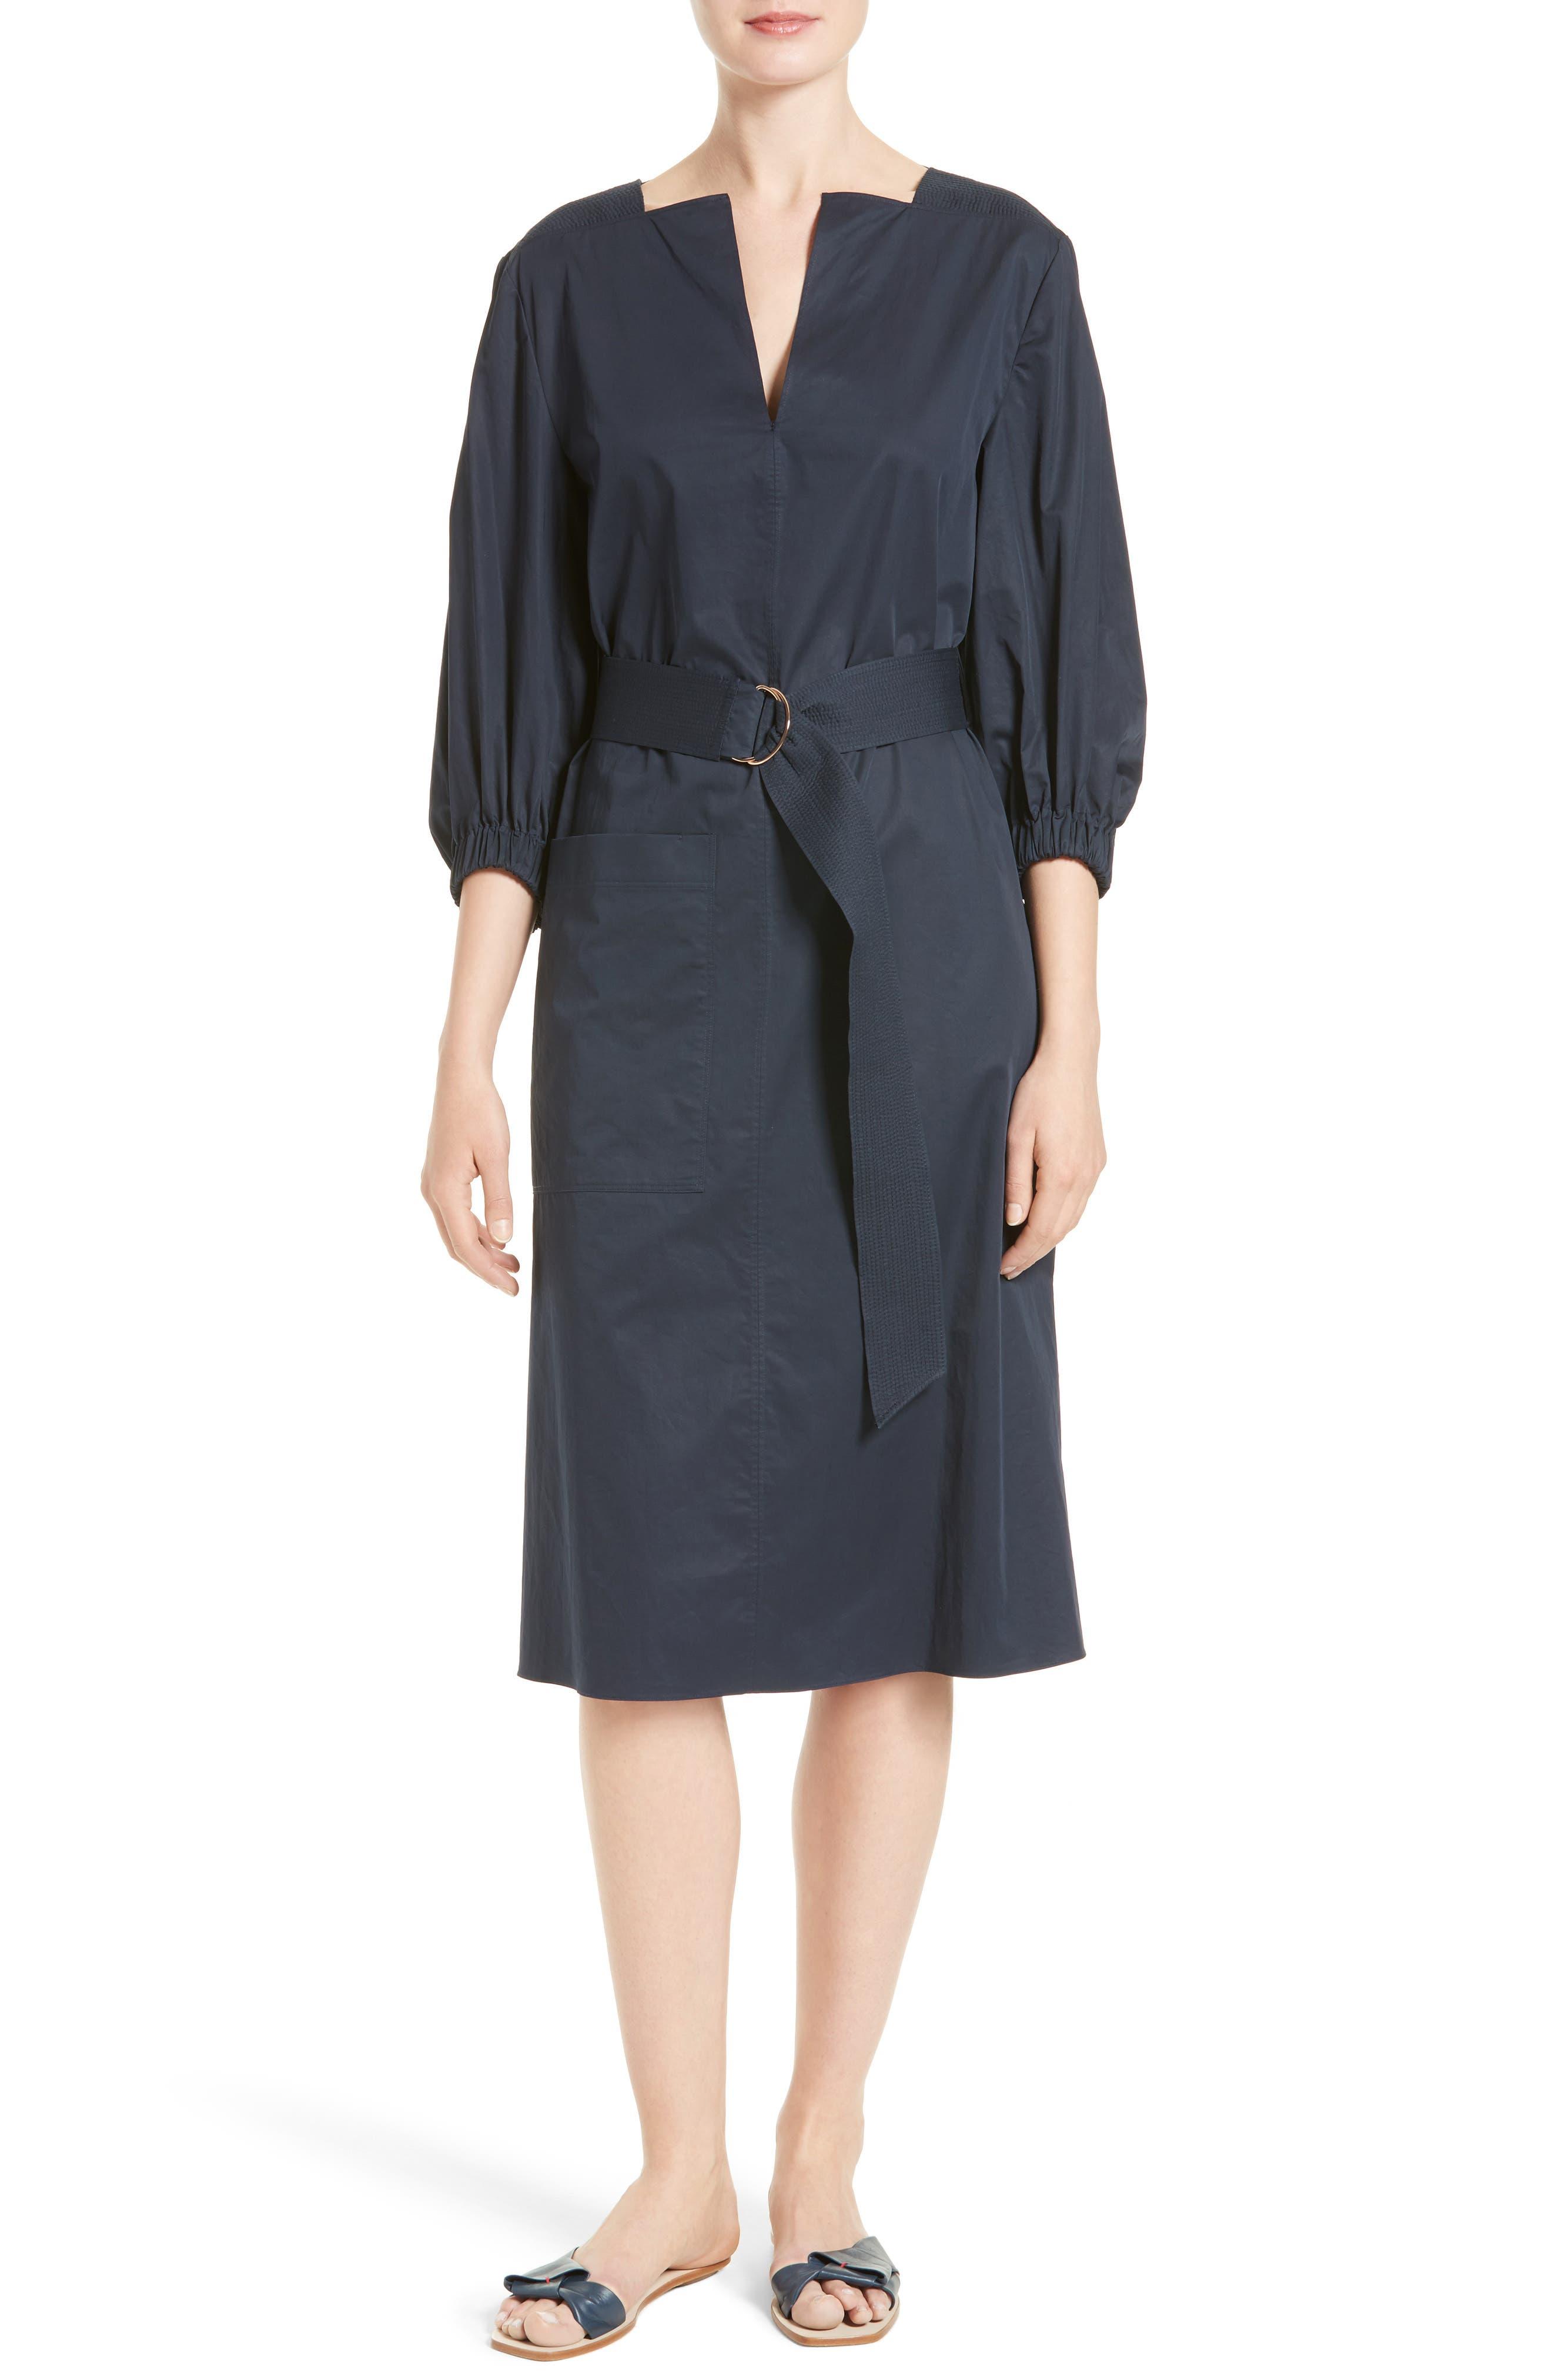 Alternate Image 1 Selected - Tibi Satin Poplin Belted Split Neck Dress